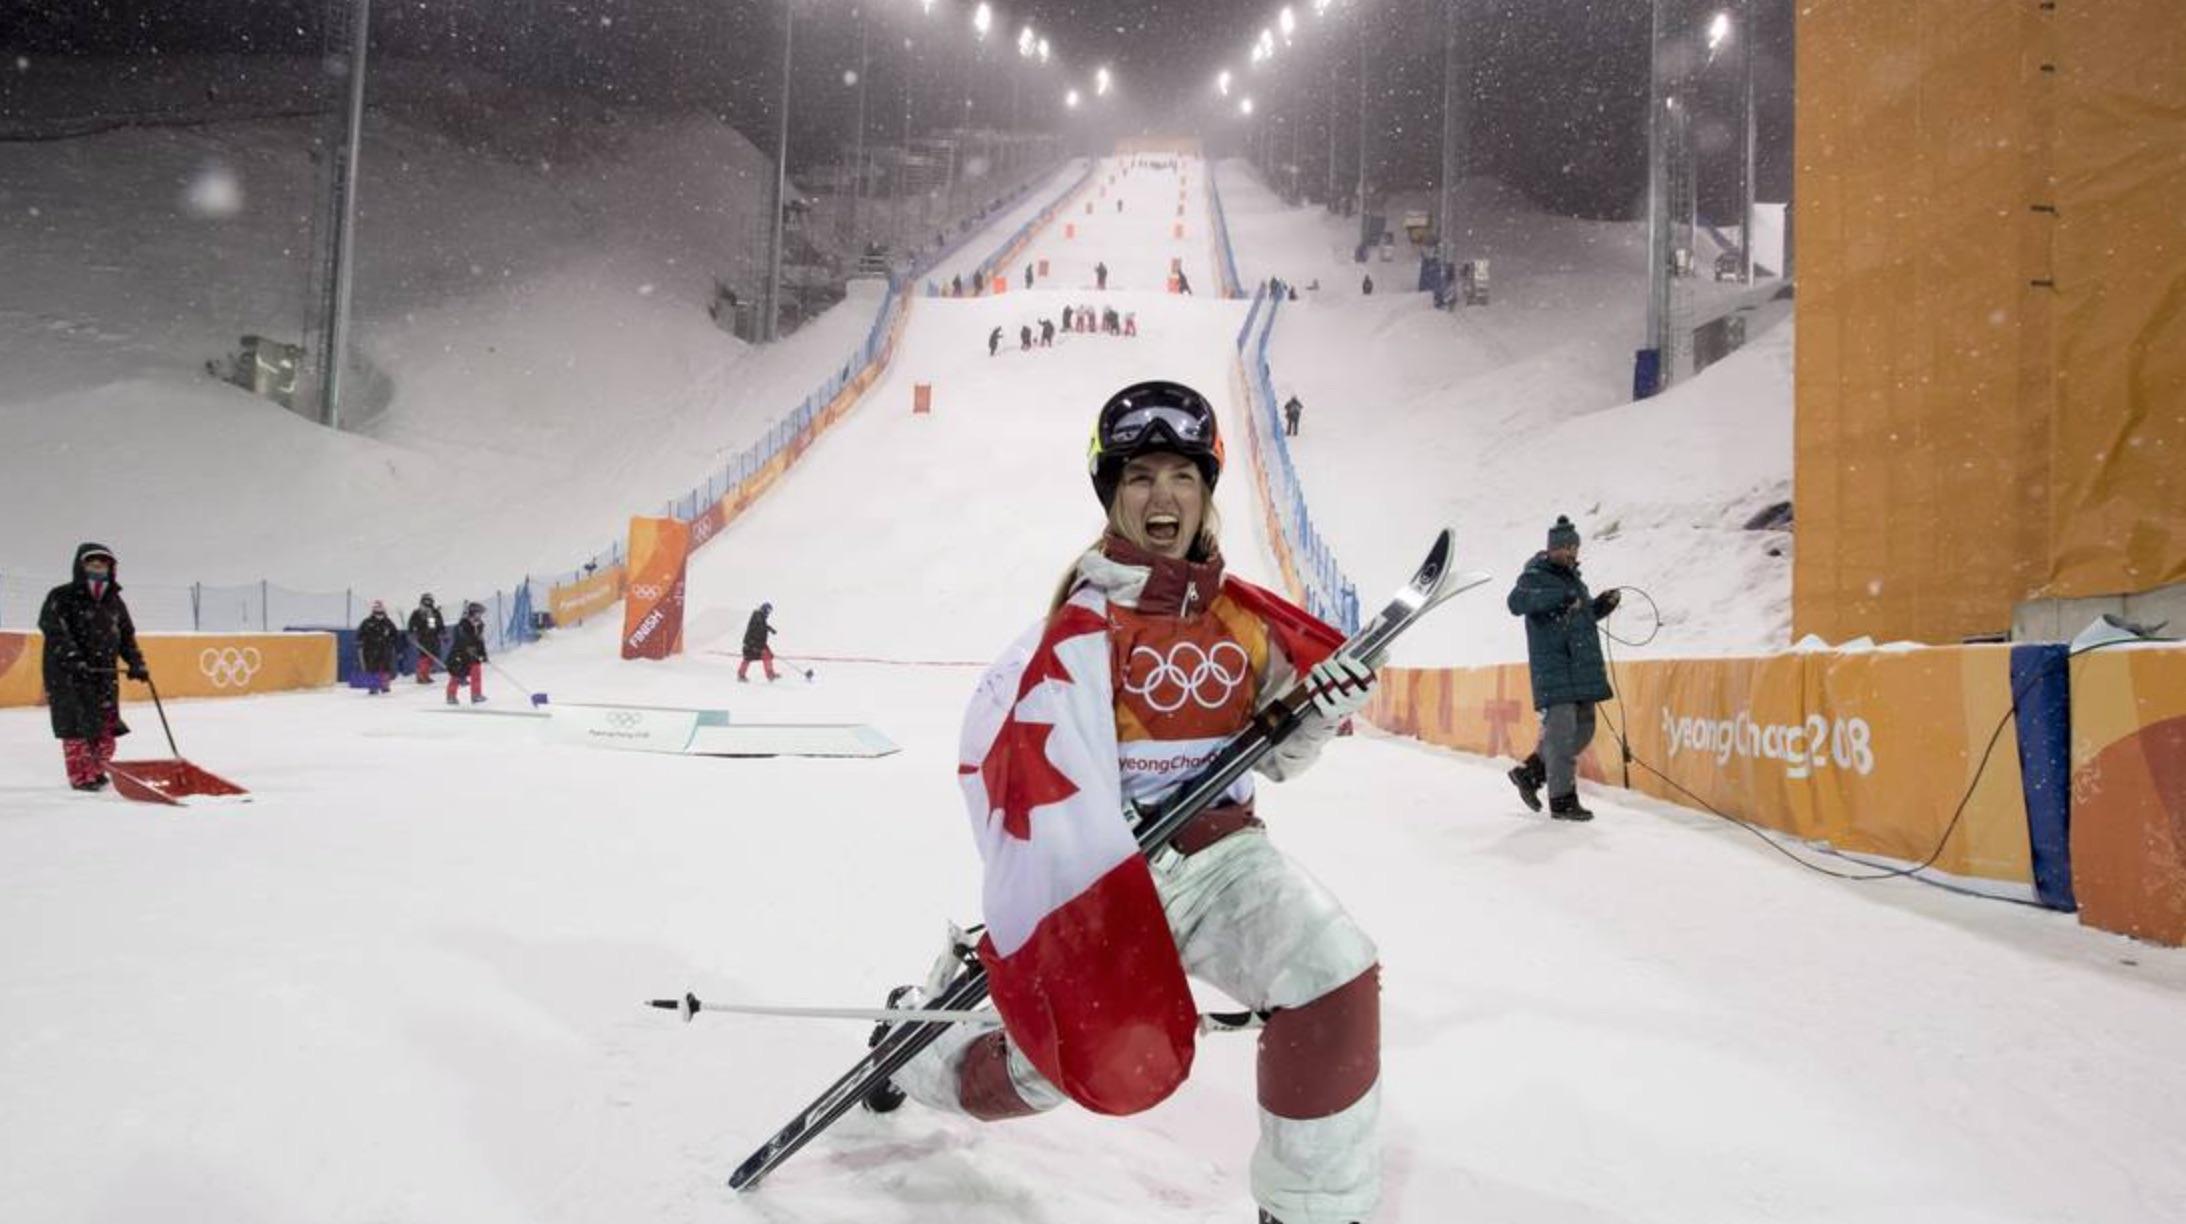 Dufour-Lapointe Olympics Moguls